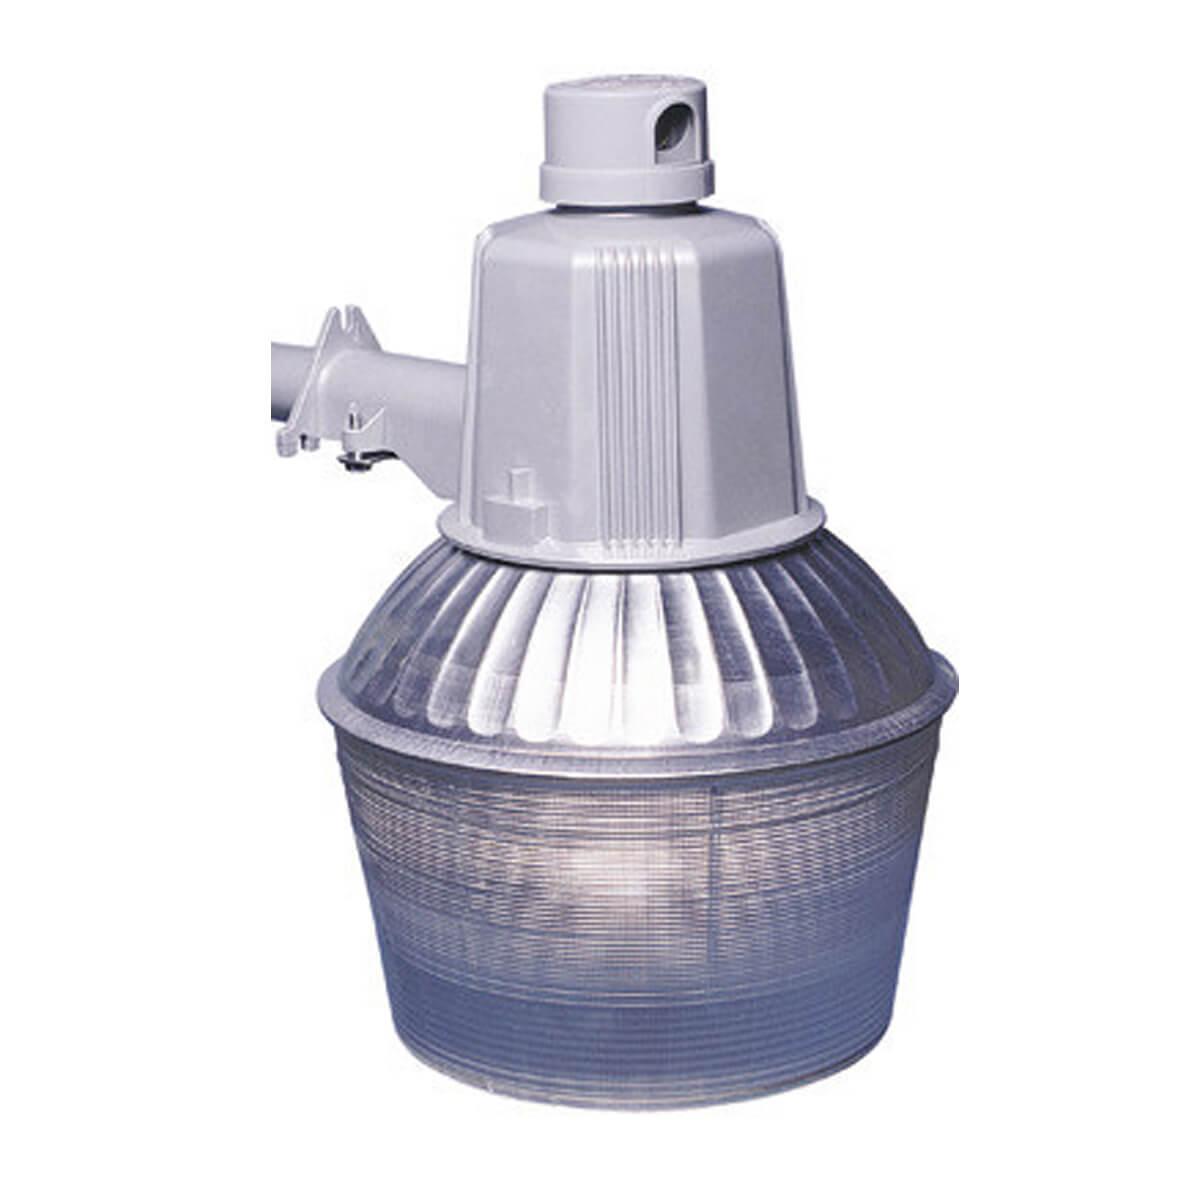 High Pressure Sodium Security Light - 150W